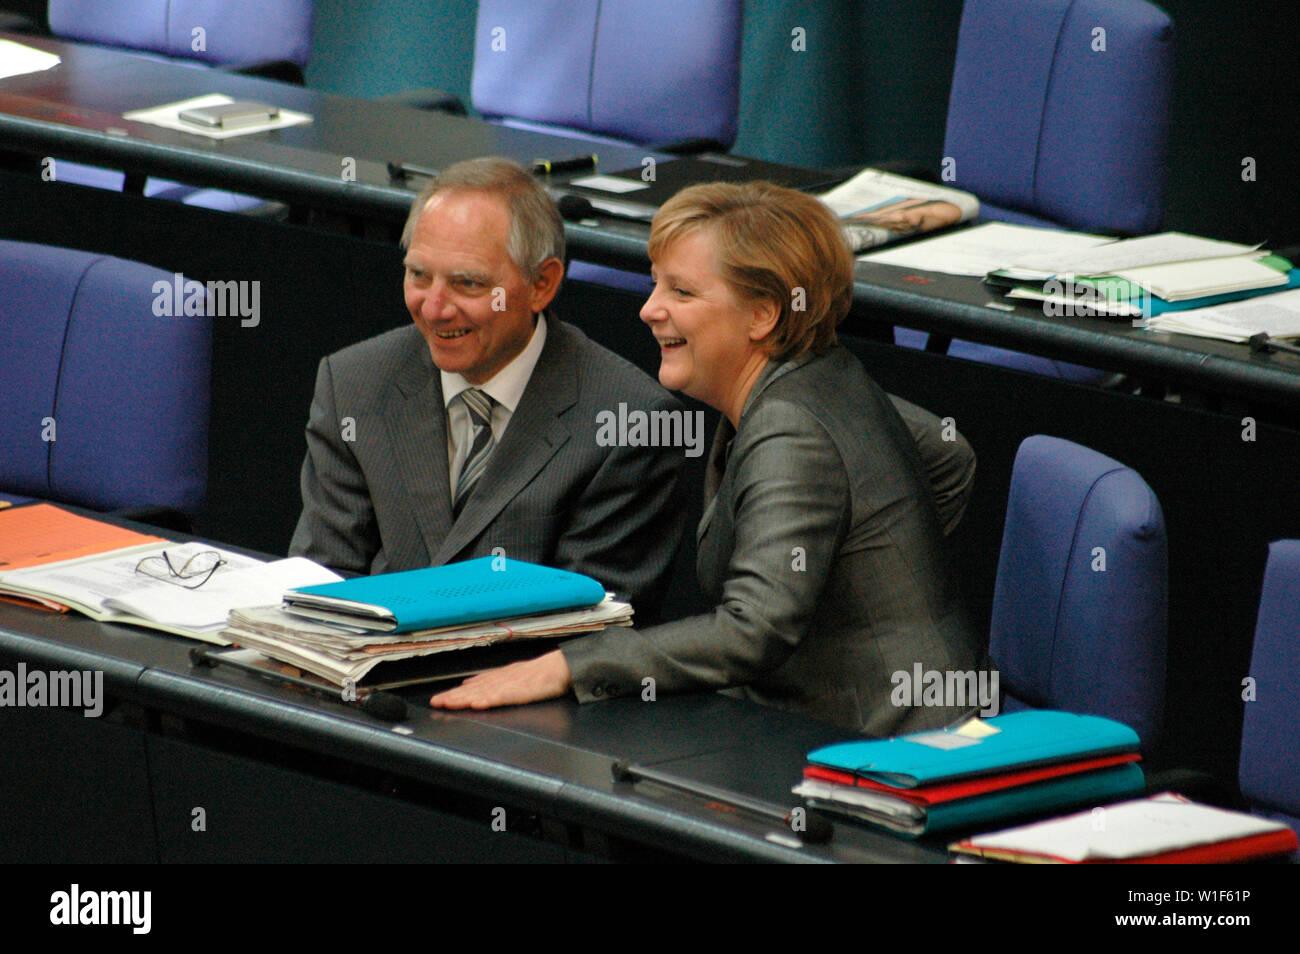 Wolfgang Schaeuble, Angela Merkel  - Sitzung im Bundestag am 29. Juni 2006, Reichstagsgebaeude, Berlin-Tiergarten . Stock Photo